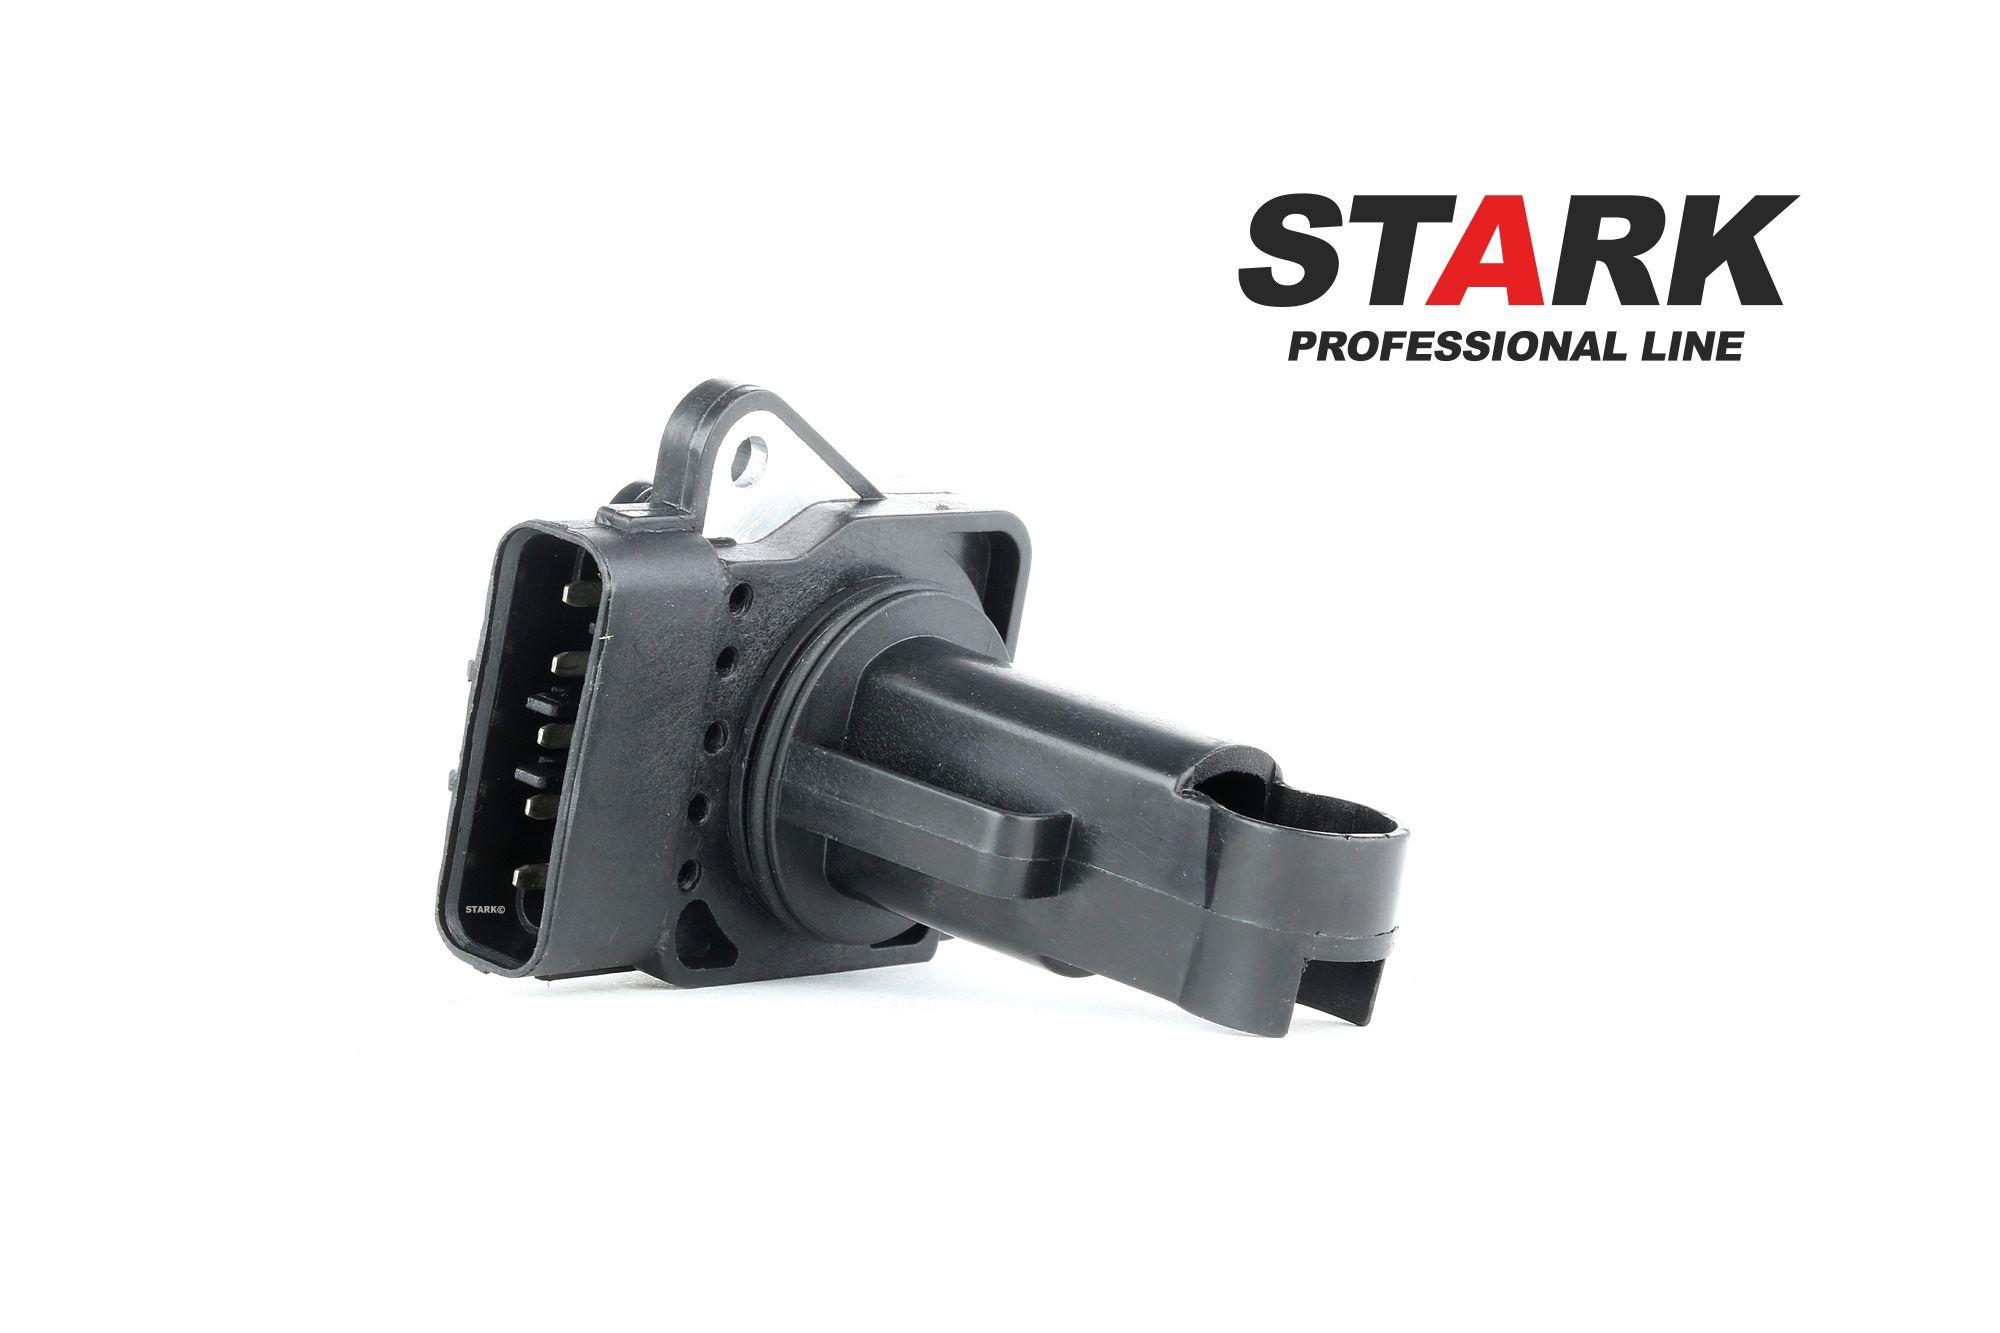 JAGUAR Mk Luftmassensensor - Original STARK SKAS-0150131 Spannung: 12V, Pol-Anzahl: 5-polig